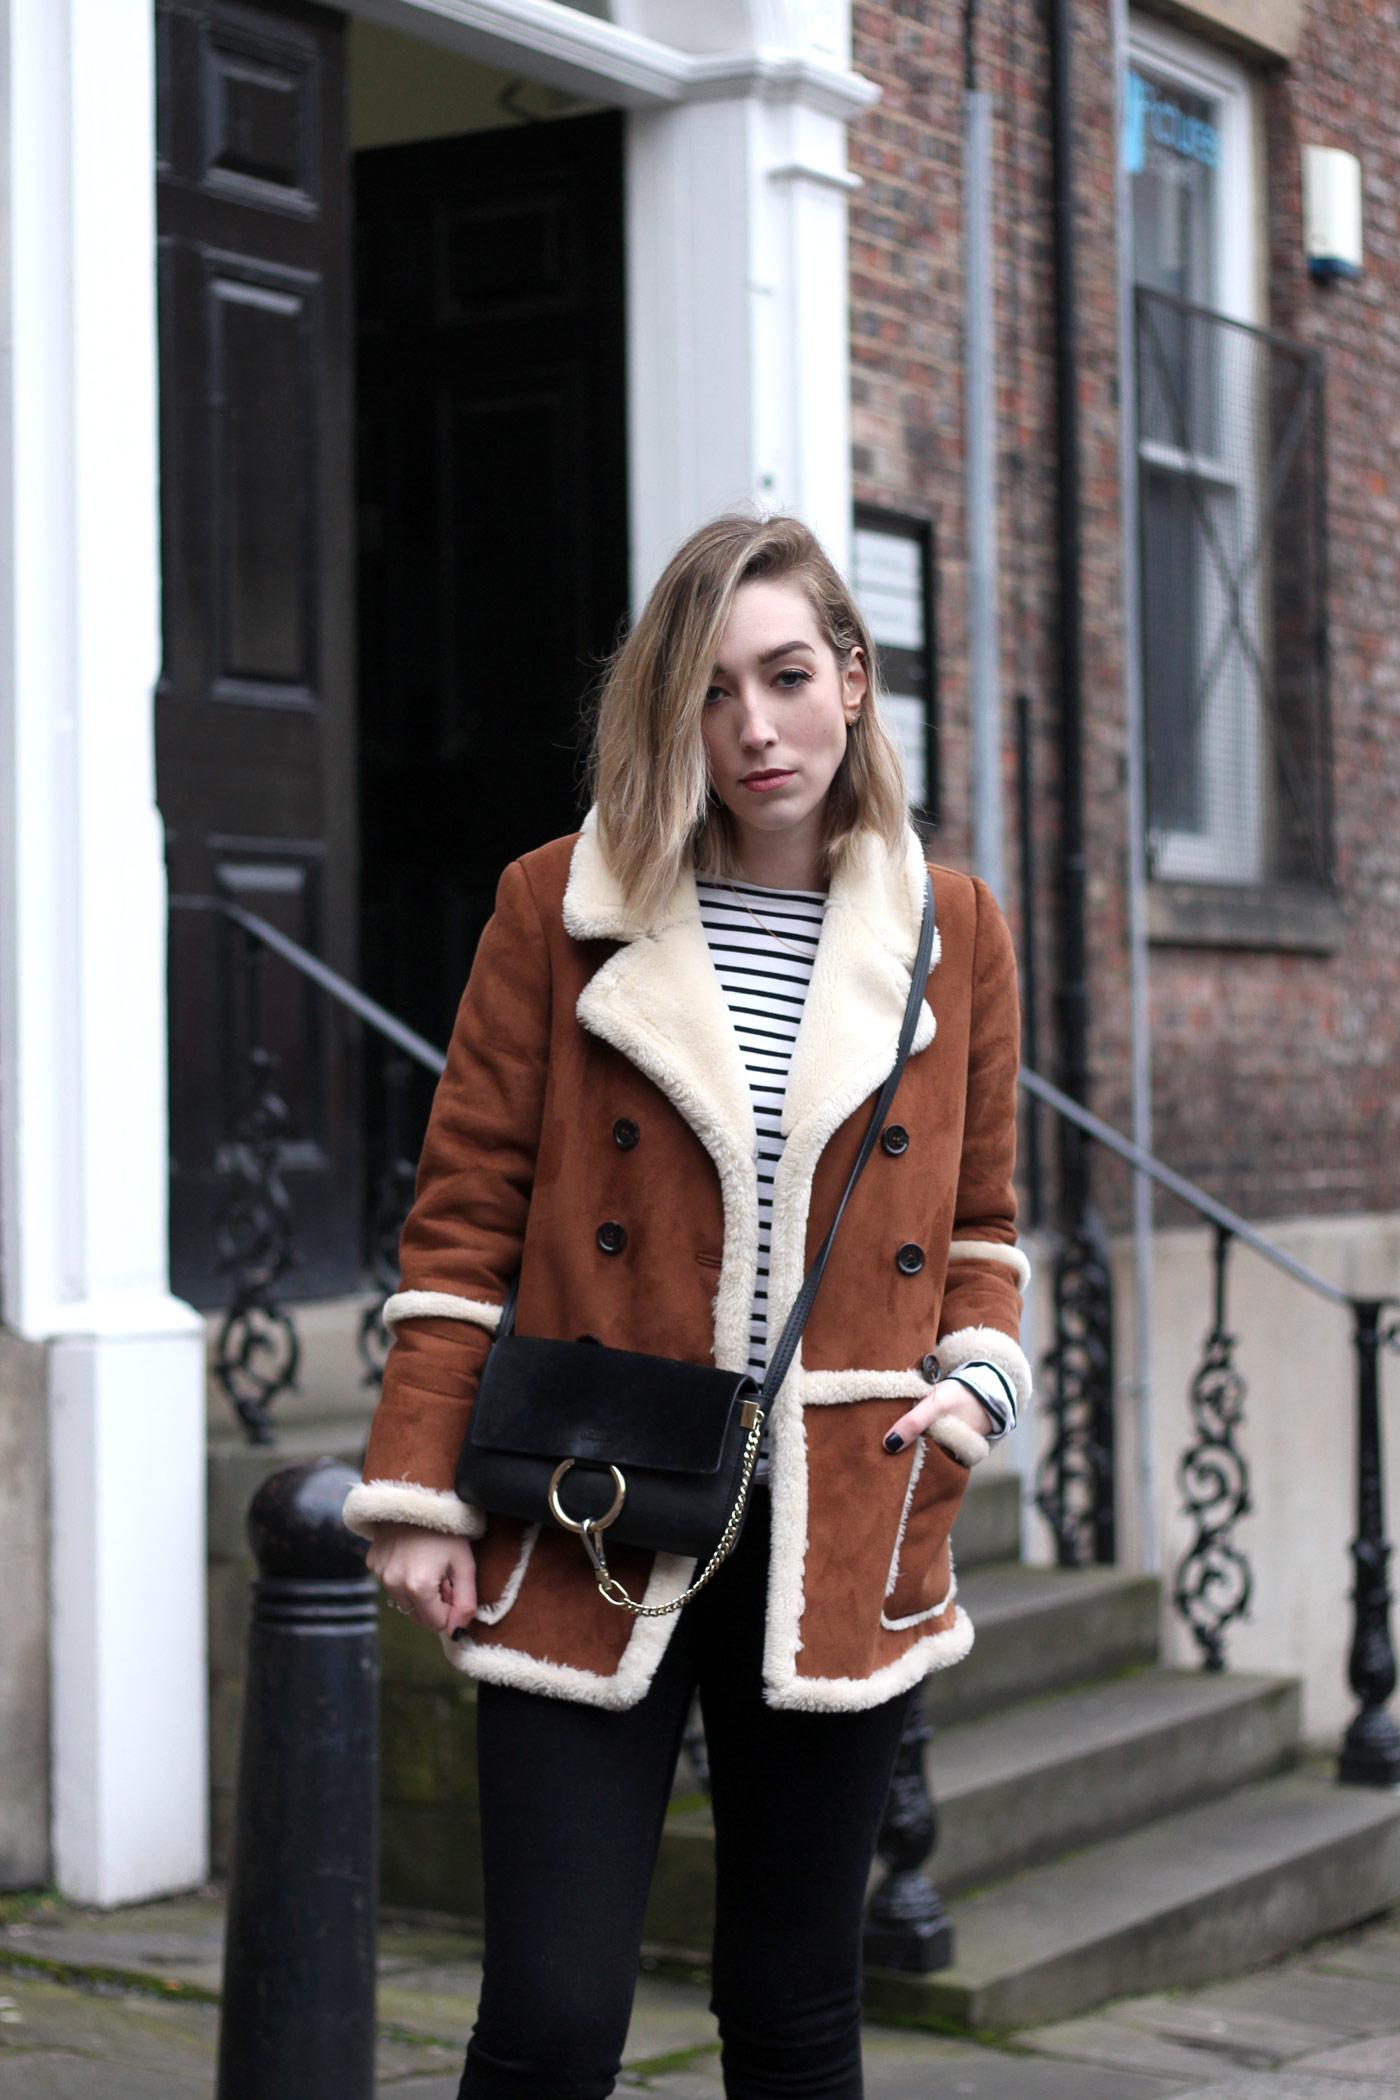 topshop-sheepskin-vintage-coat-chloe-faye-black-acne-jensen-suede7